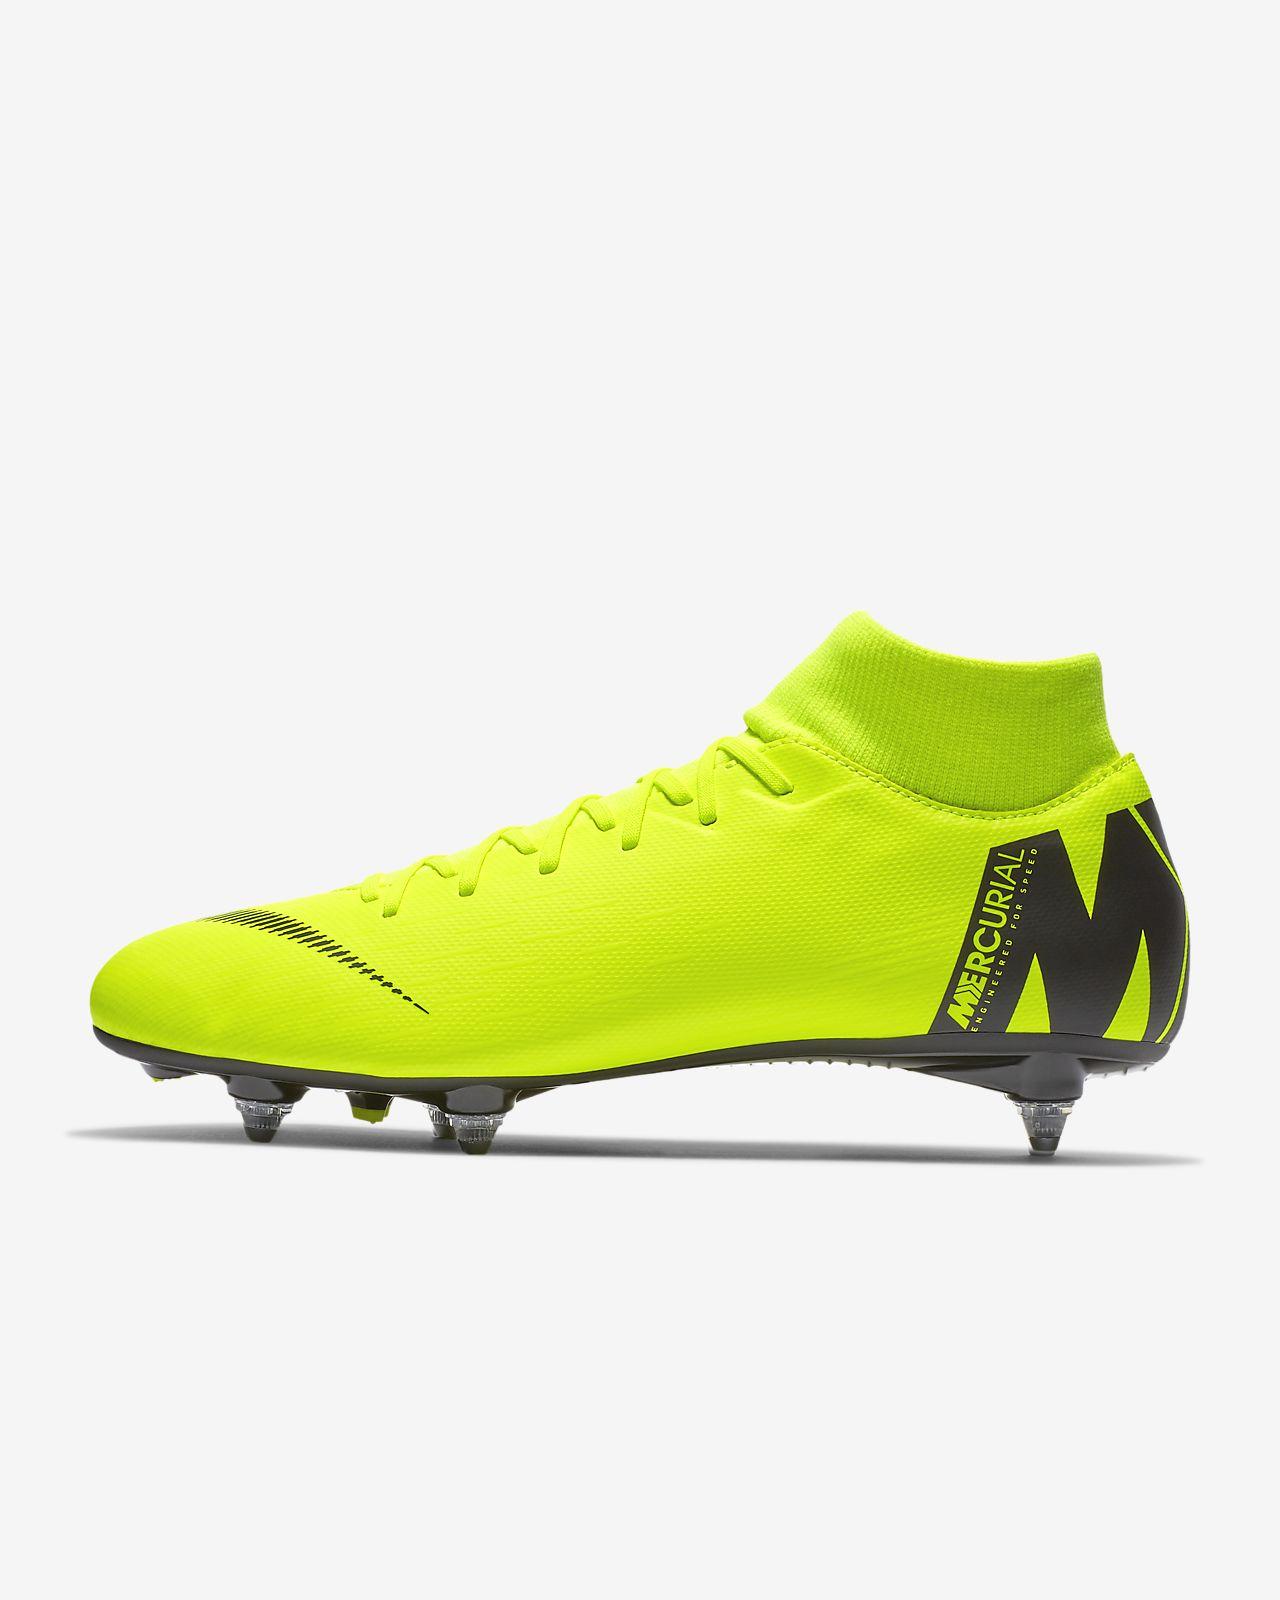 3ad7afe98c58 Футбольные бутсы для игры на мягком грунте Nike Mercurial Superfly VI  Academy SG-PRO